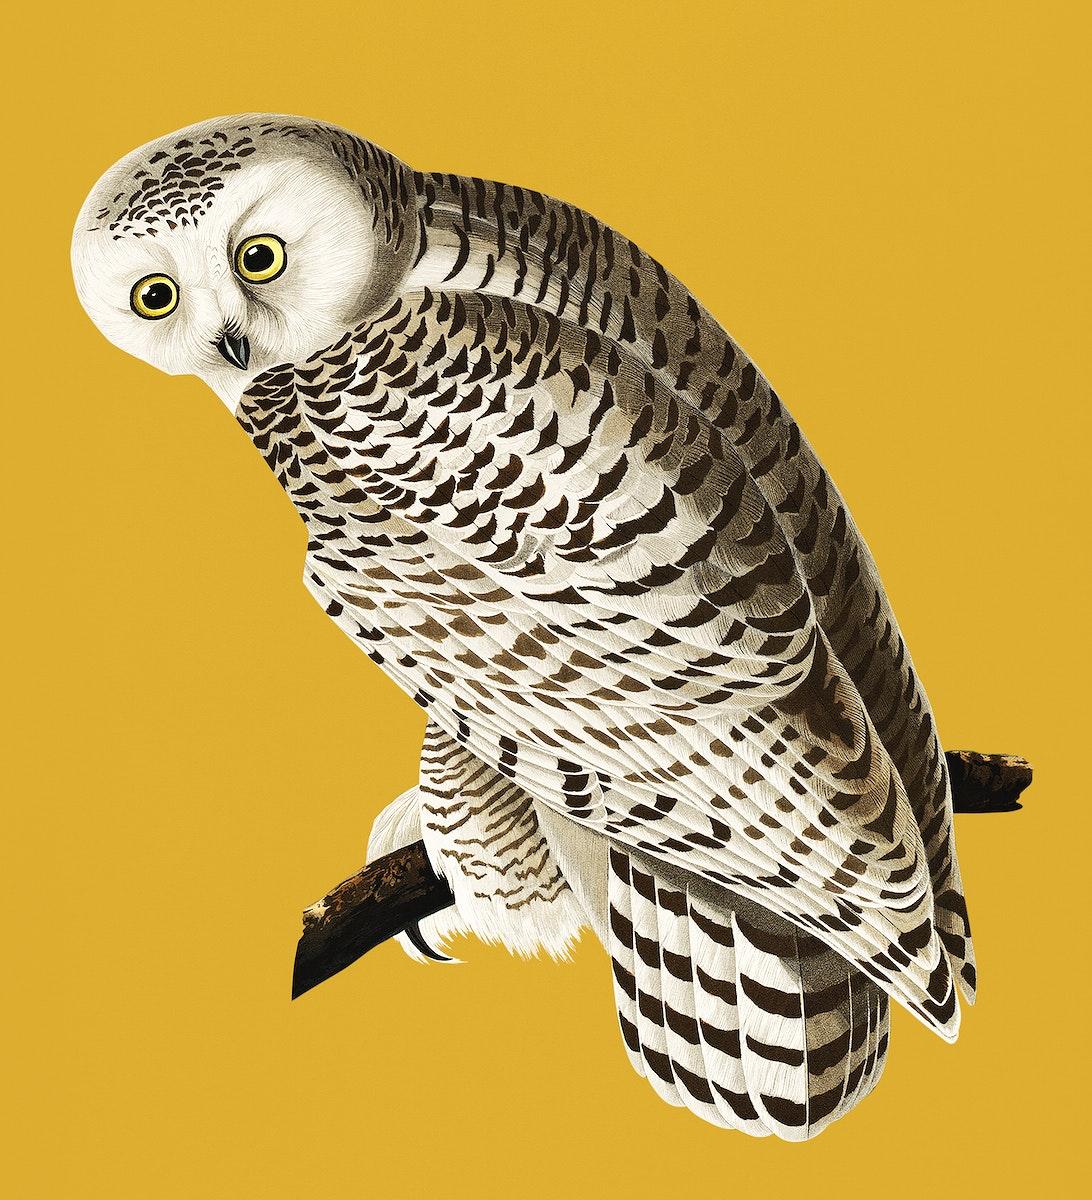 Vintage Illustration of Snowy Owl.